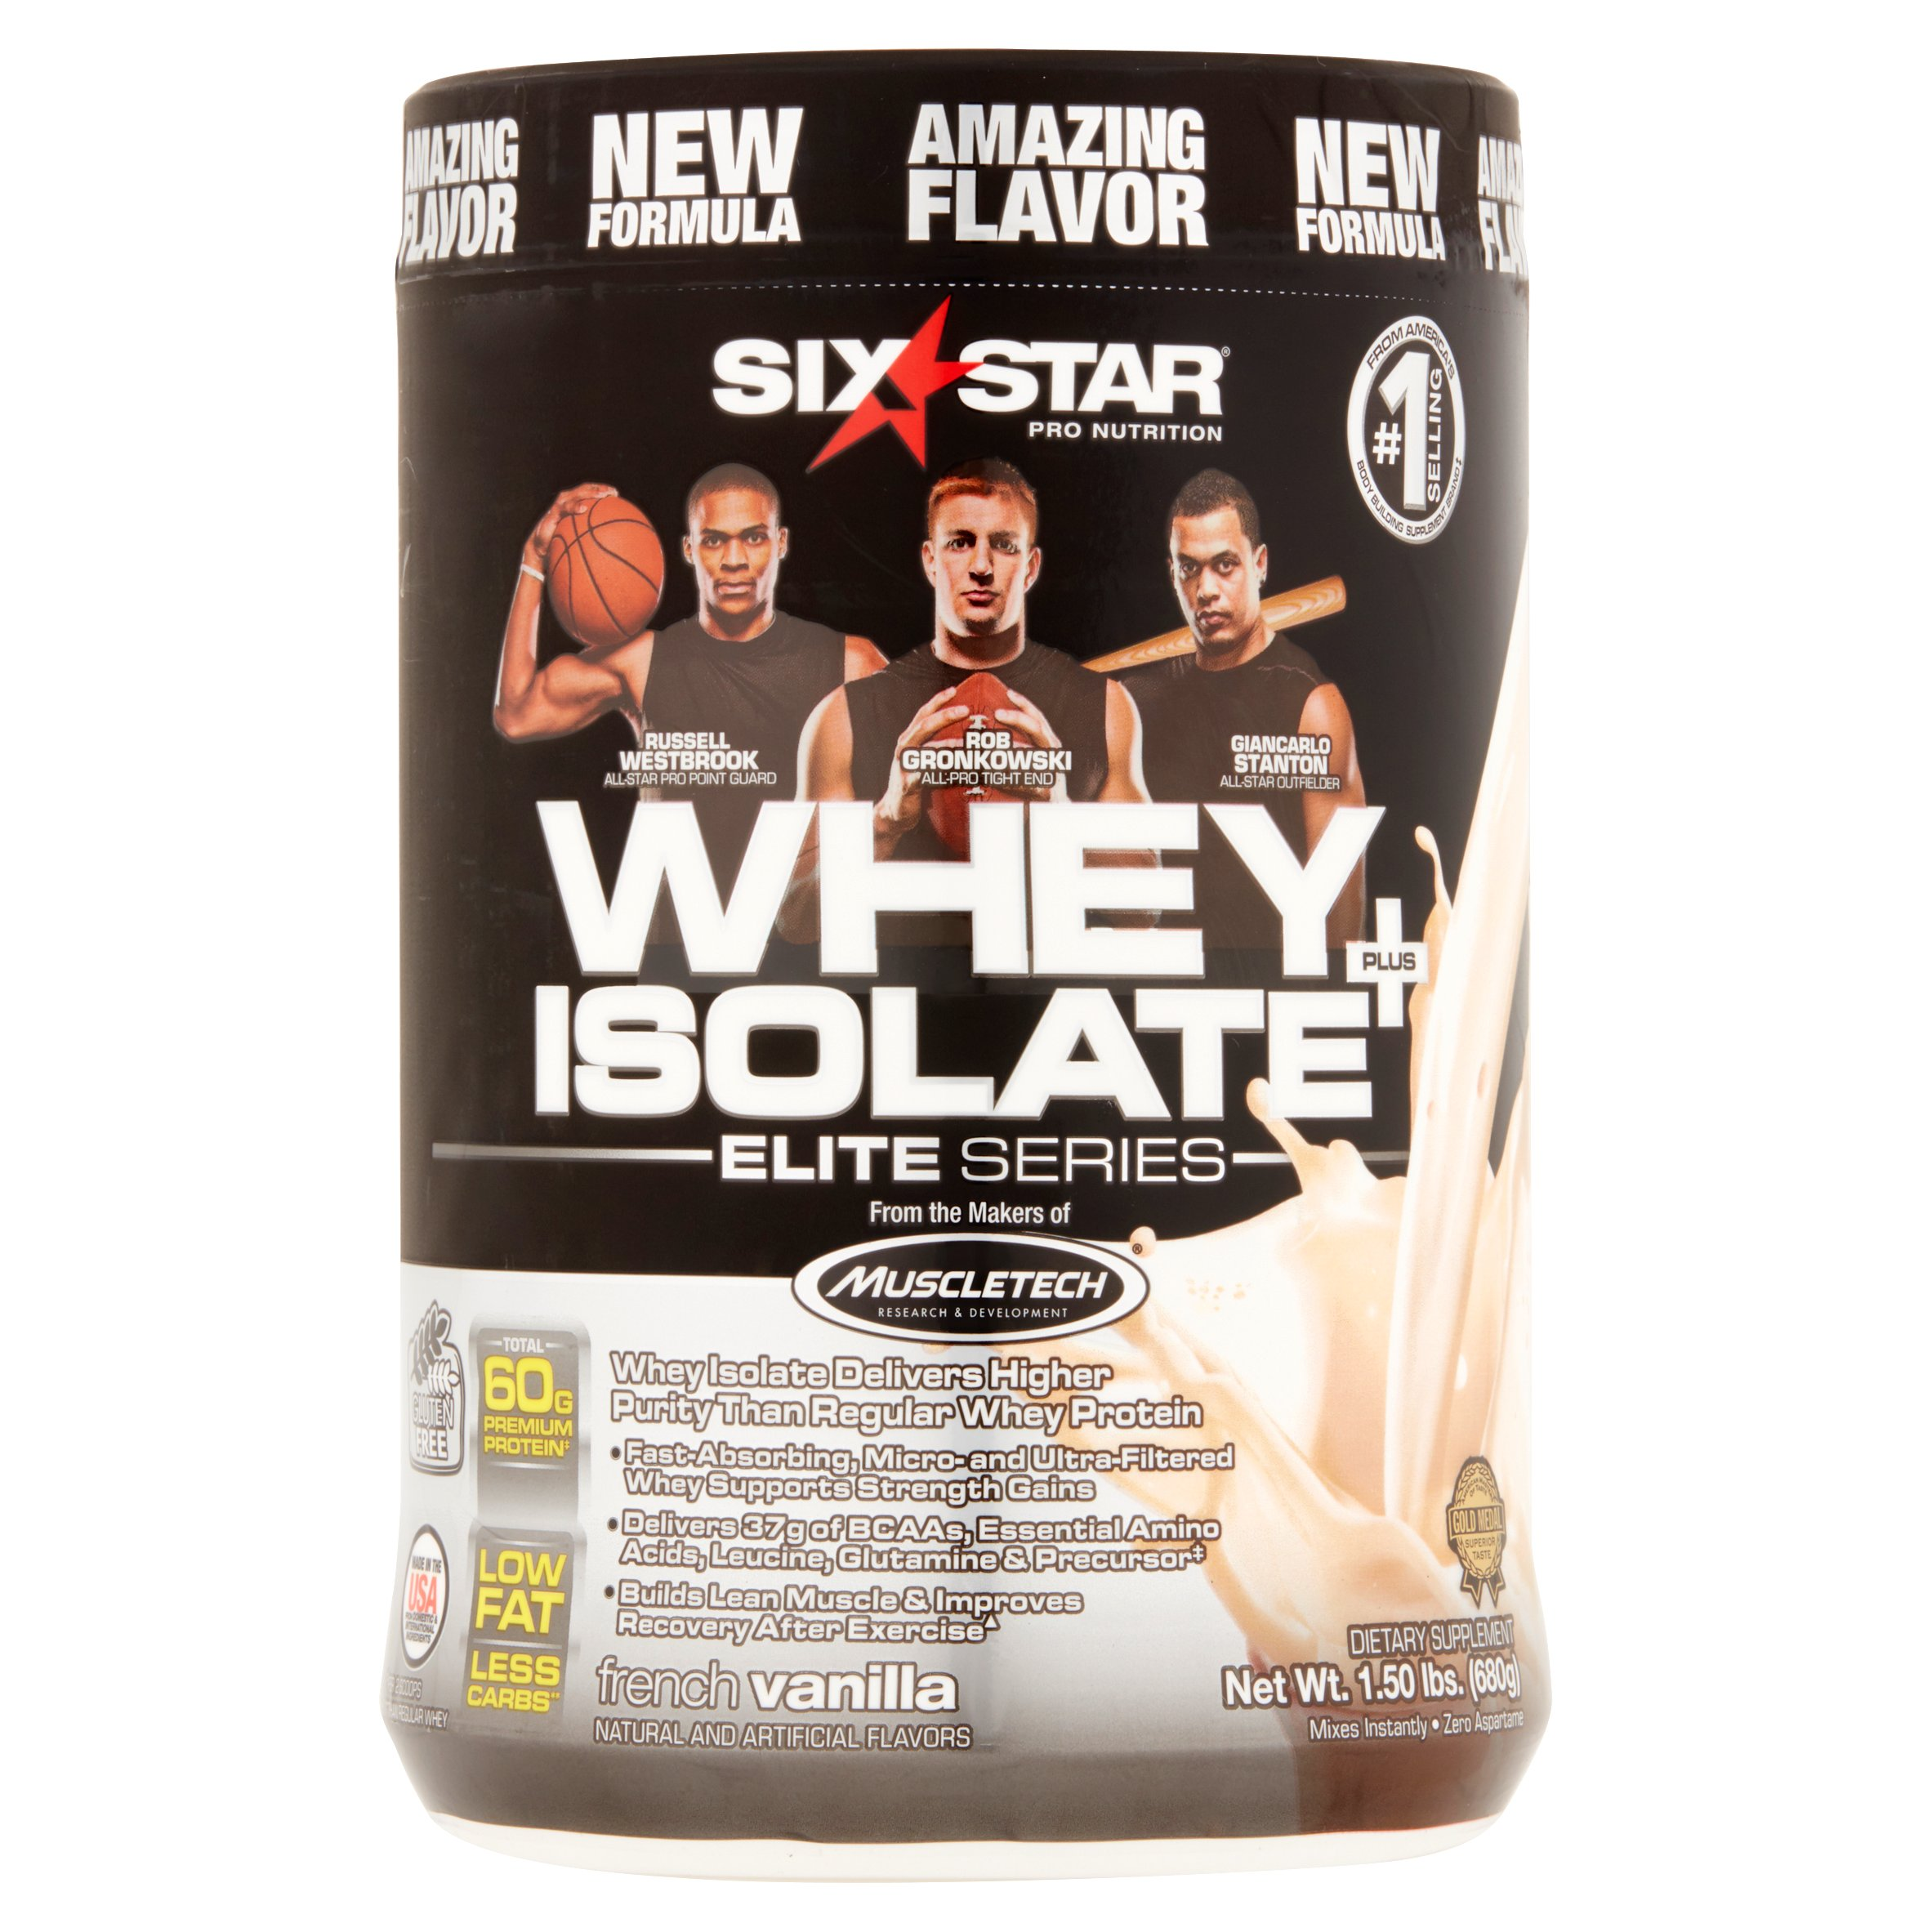 Six Star Elite Series Whey Isolate Protein Powder 30 grams of Protein Vanilla Cream, 1.50 lbs